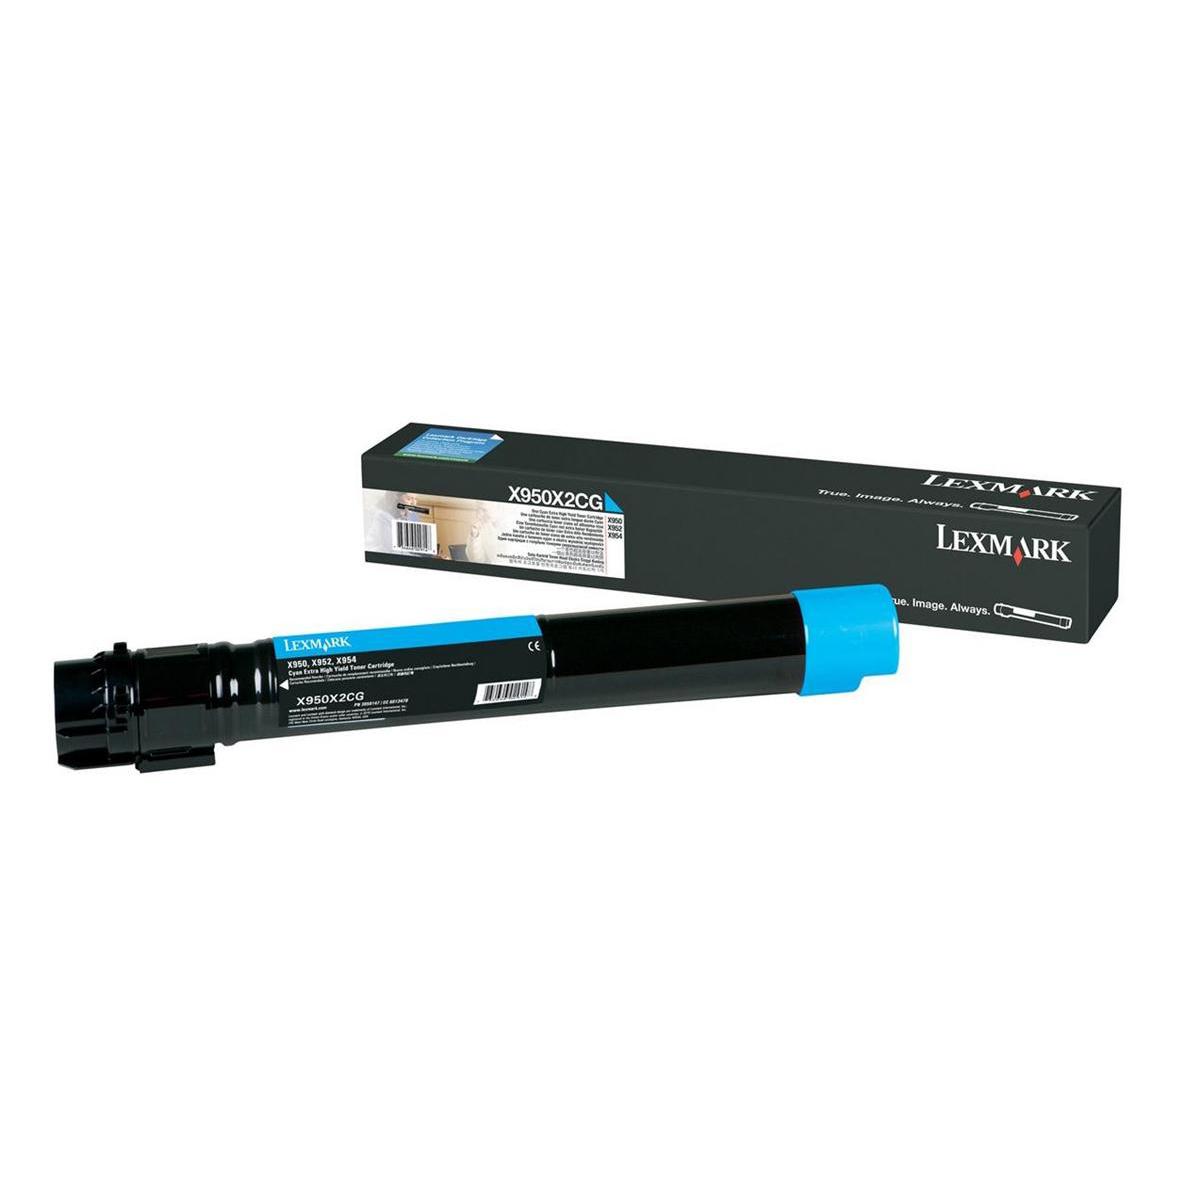 Lexmark X95x Laser Toner Cartridge Extra High Yield Page Life 22000pp Cyan Ref X950X2CG